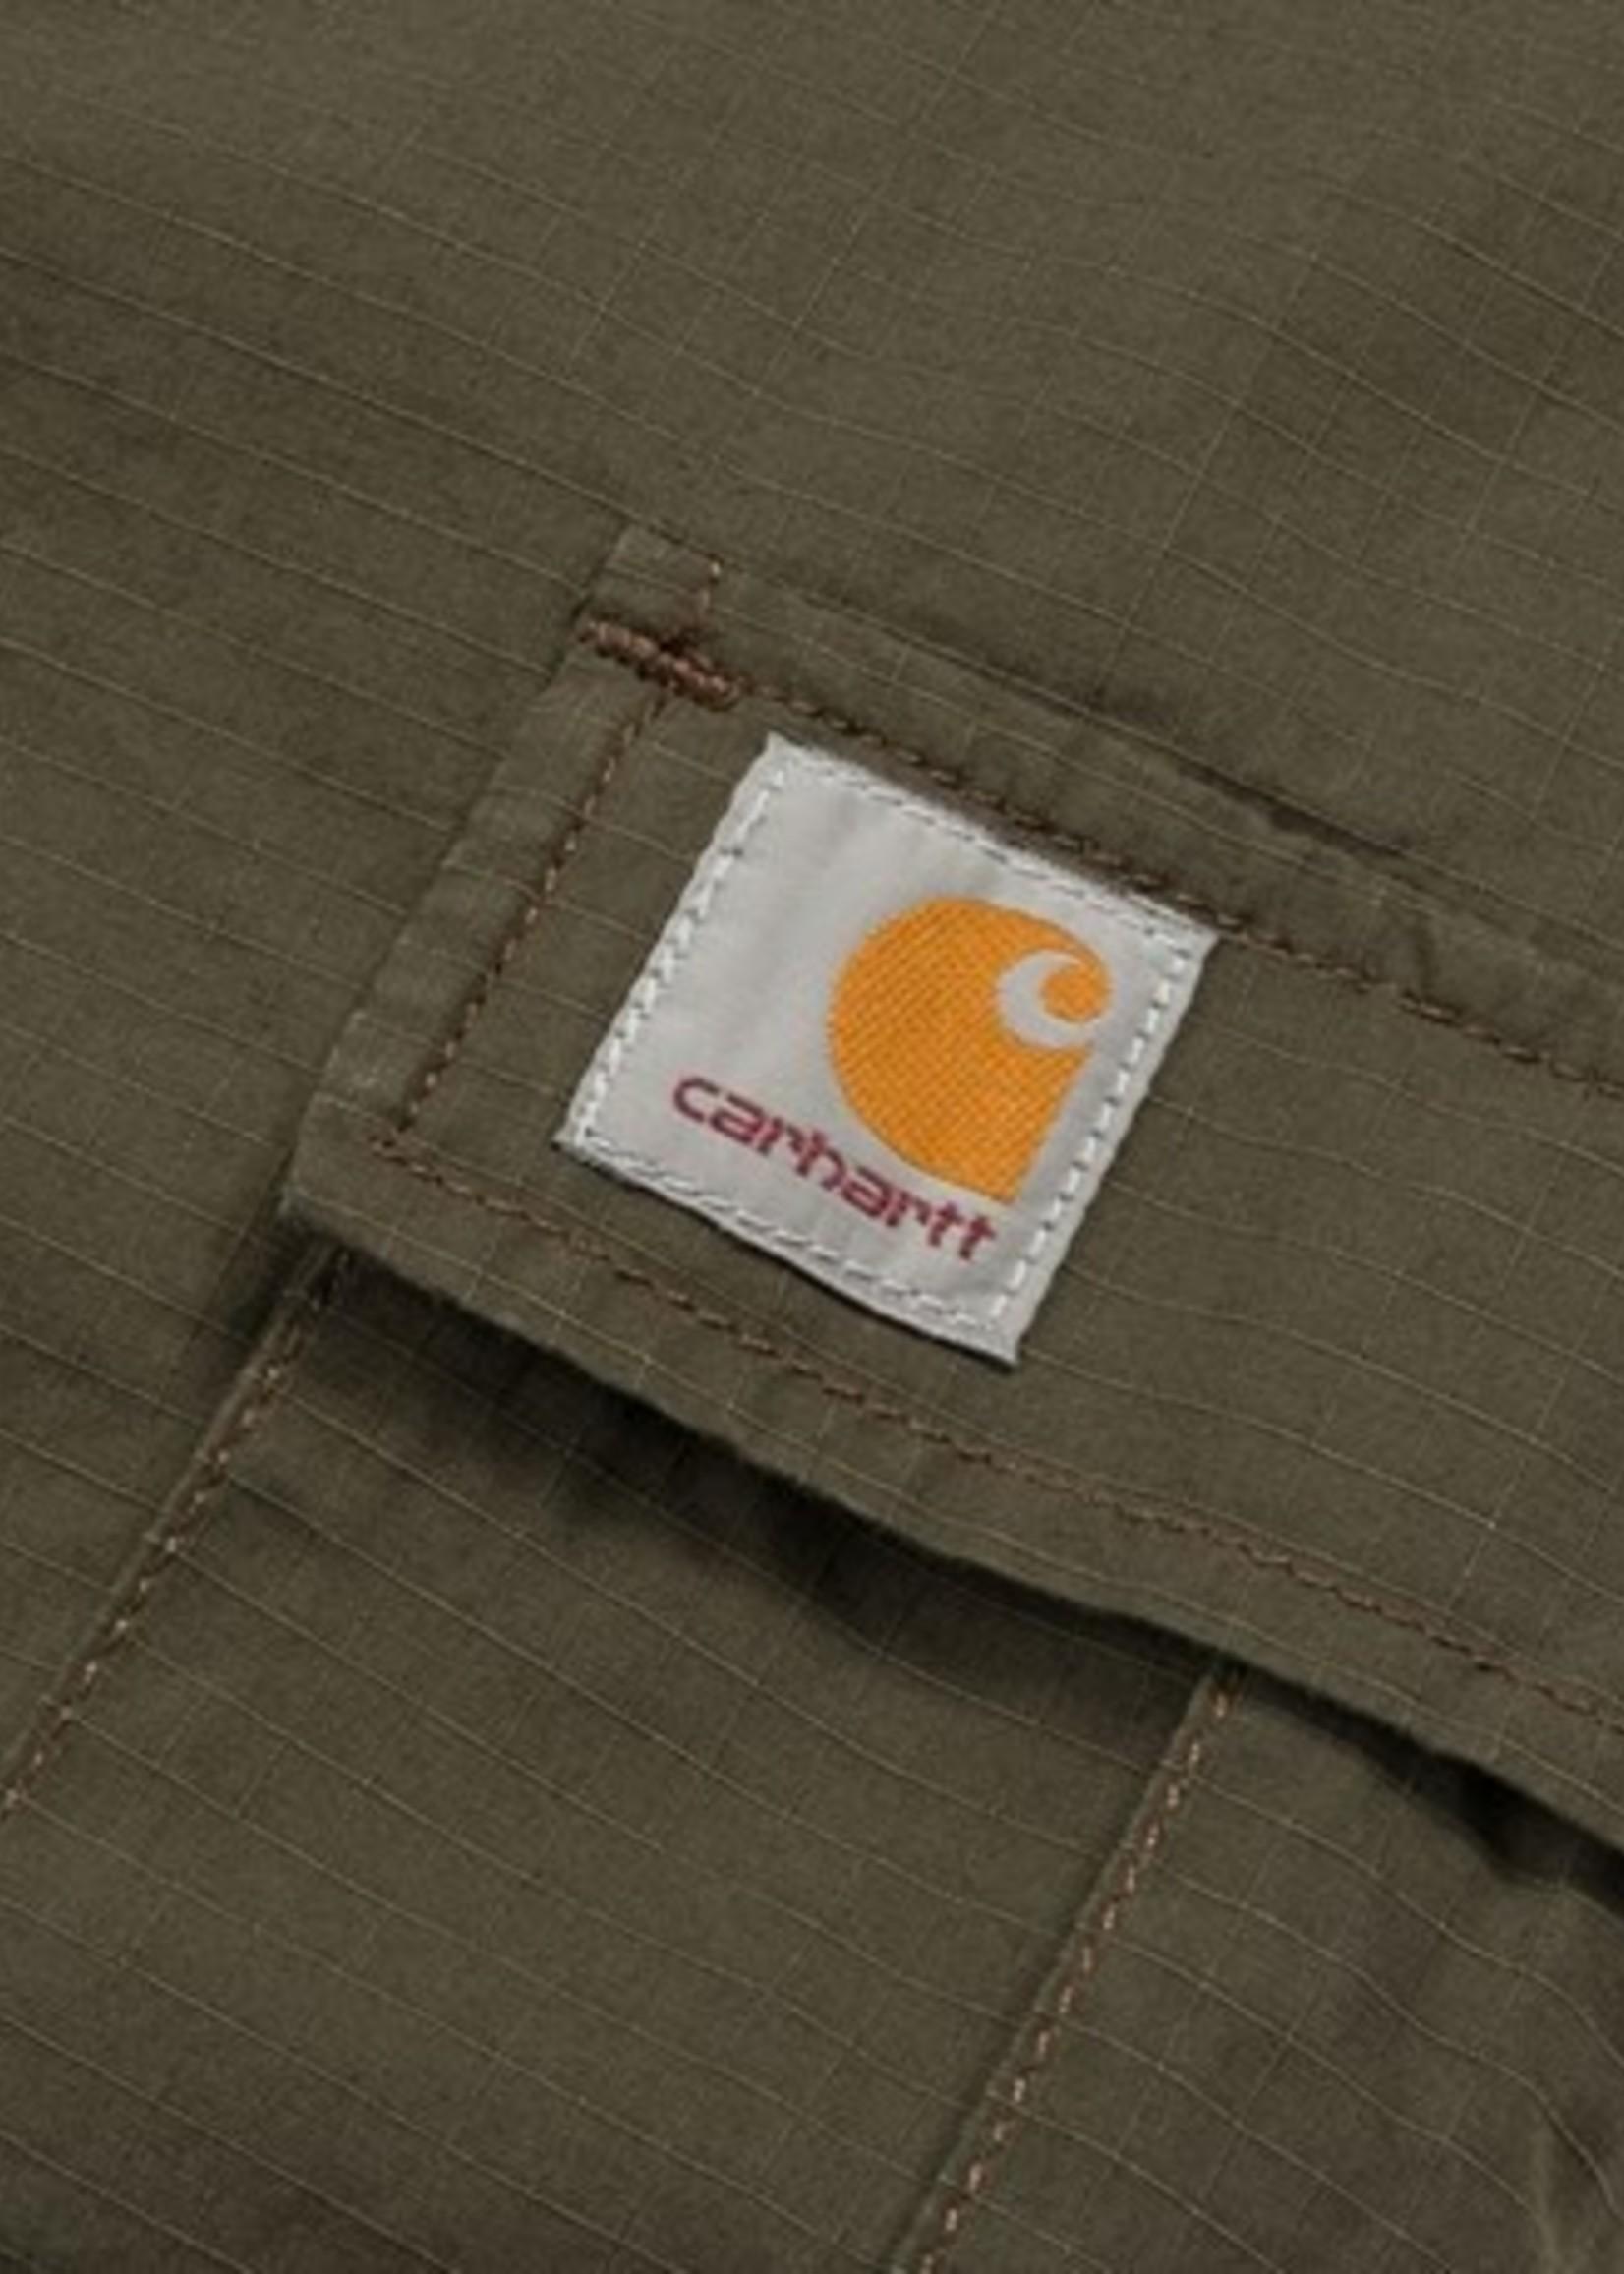 Carhartt Work In Progress Aviation Cargo Pant in Cypress